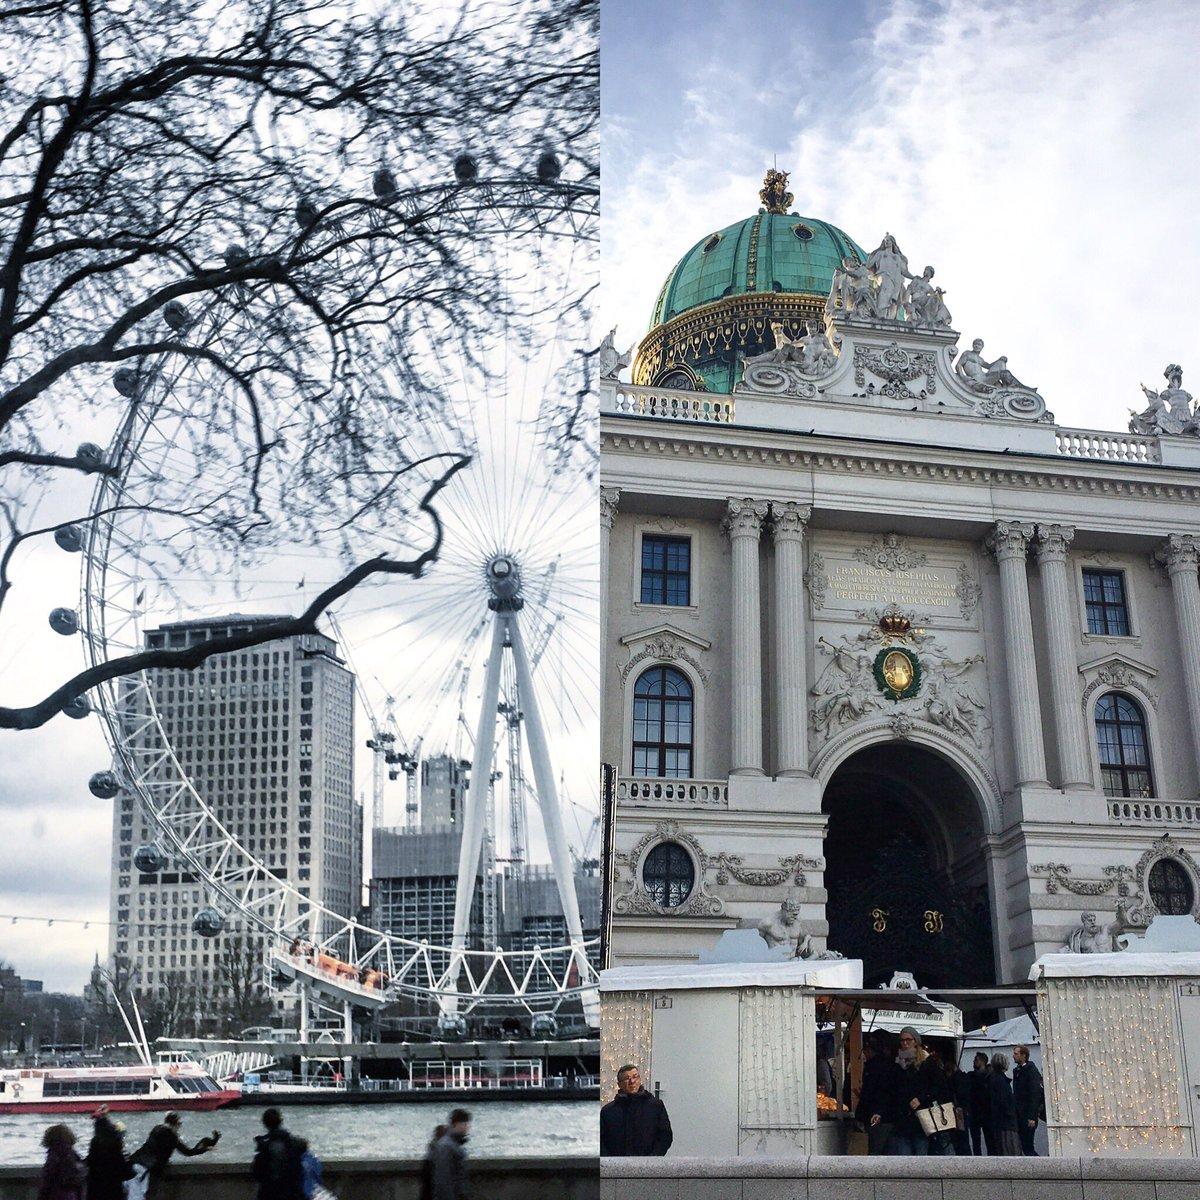 LONDON or VIENA? RT: London Like: Viena  #london #viena <br>http://pic.twitter.com/bF4Twm1wWg